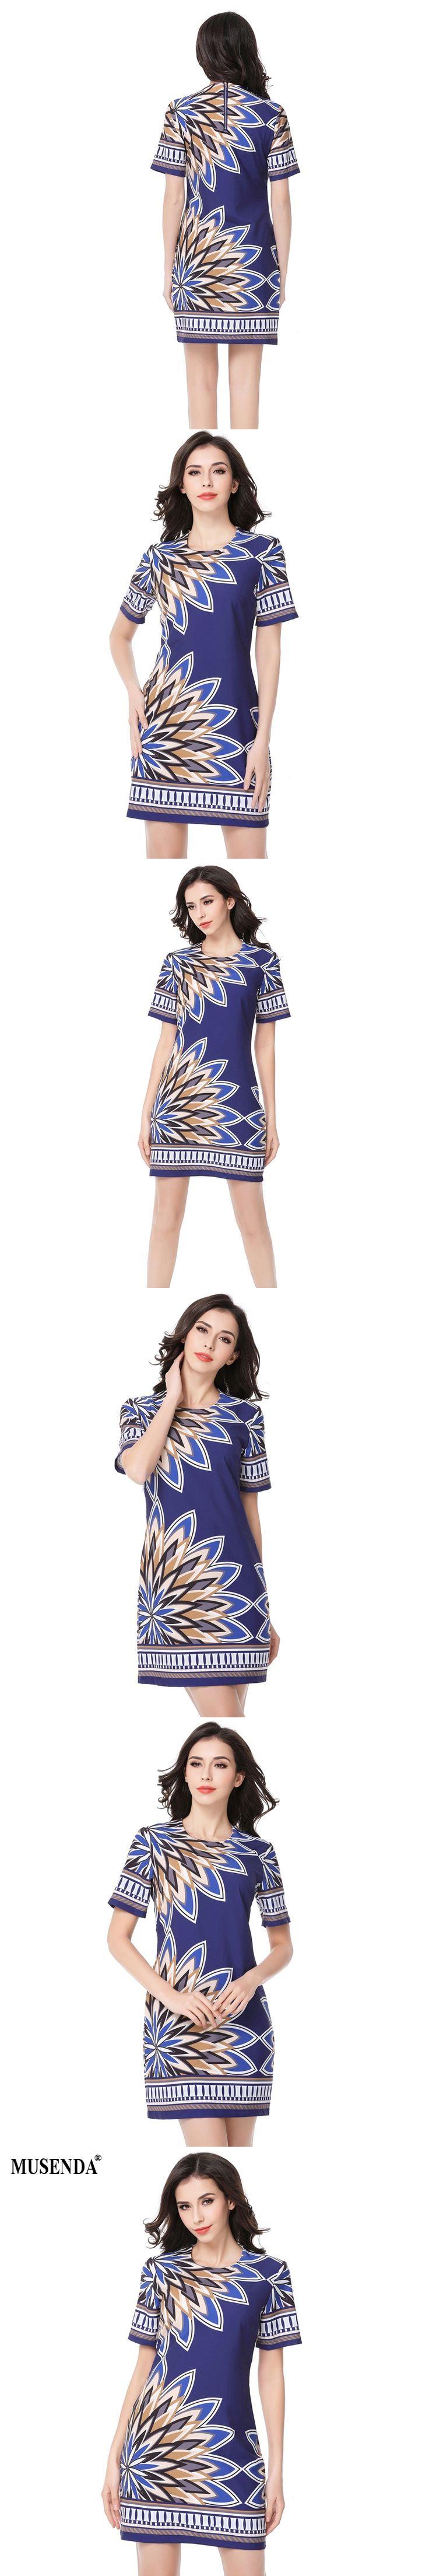 MUSENDA Women 2017 Summer Print Dress Navy Blue Short Dresses Lady Elegant Casual Fashion Party Office Dress Sundress Vestidos